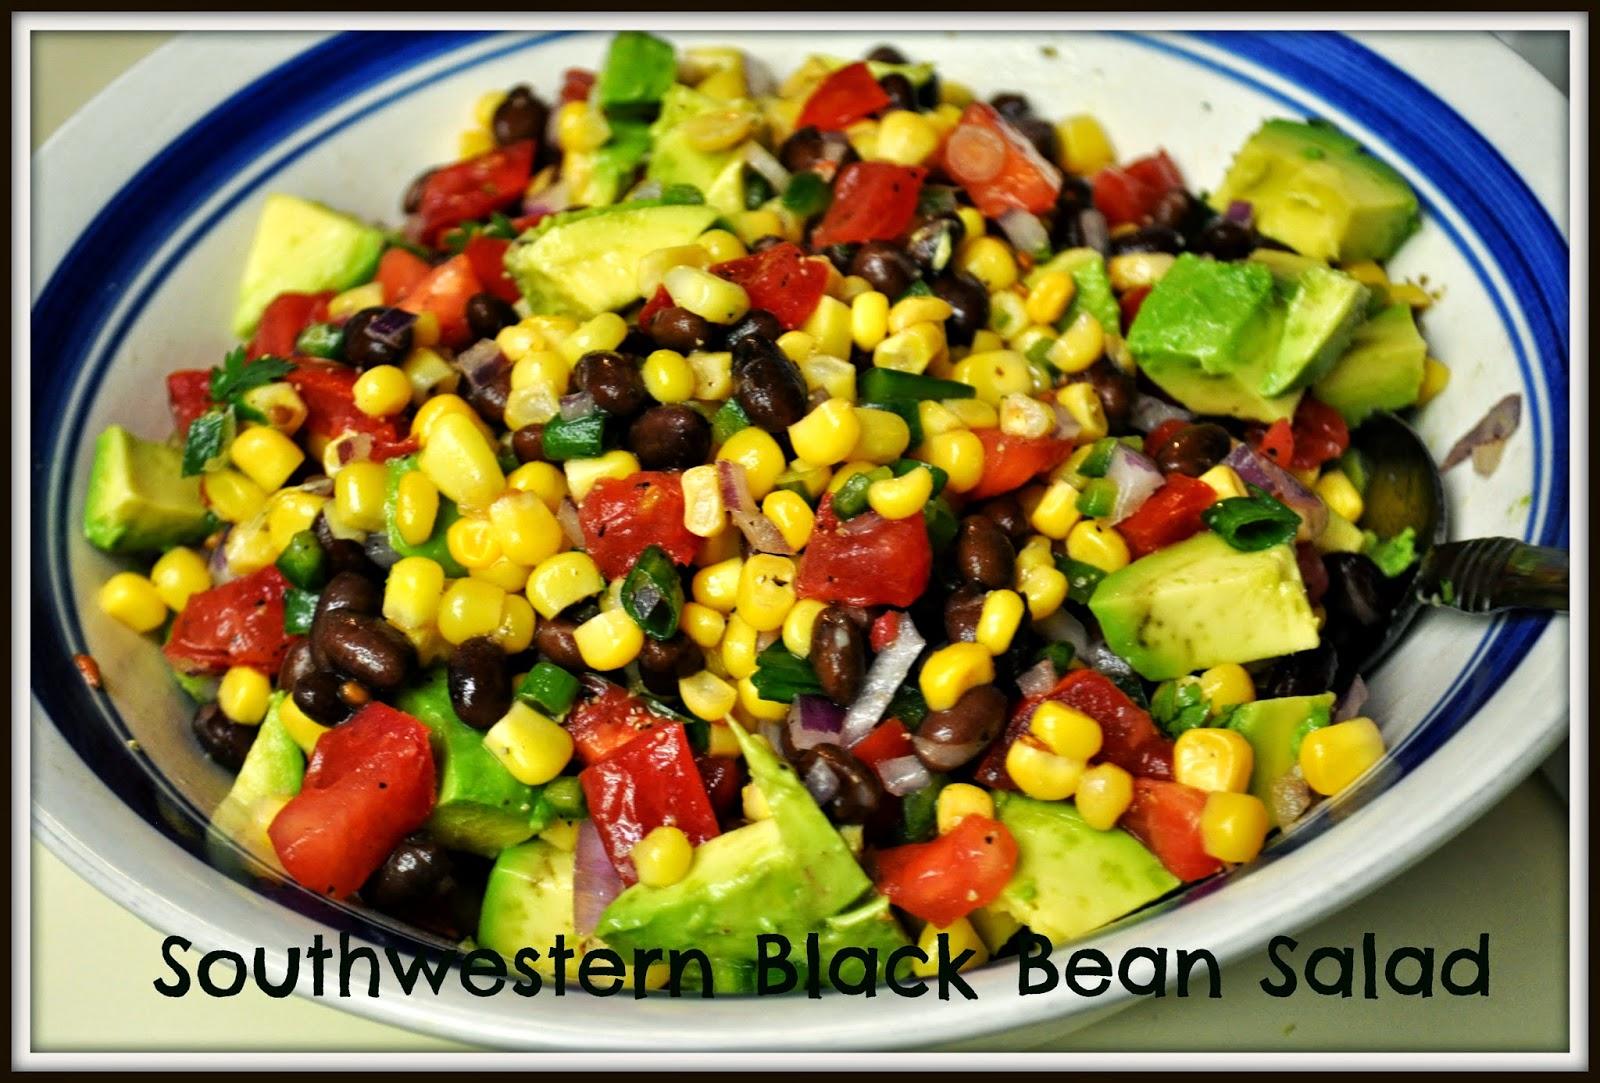 Southwestern Black Bean Salad | The Grateful Girl Cooks!